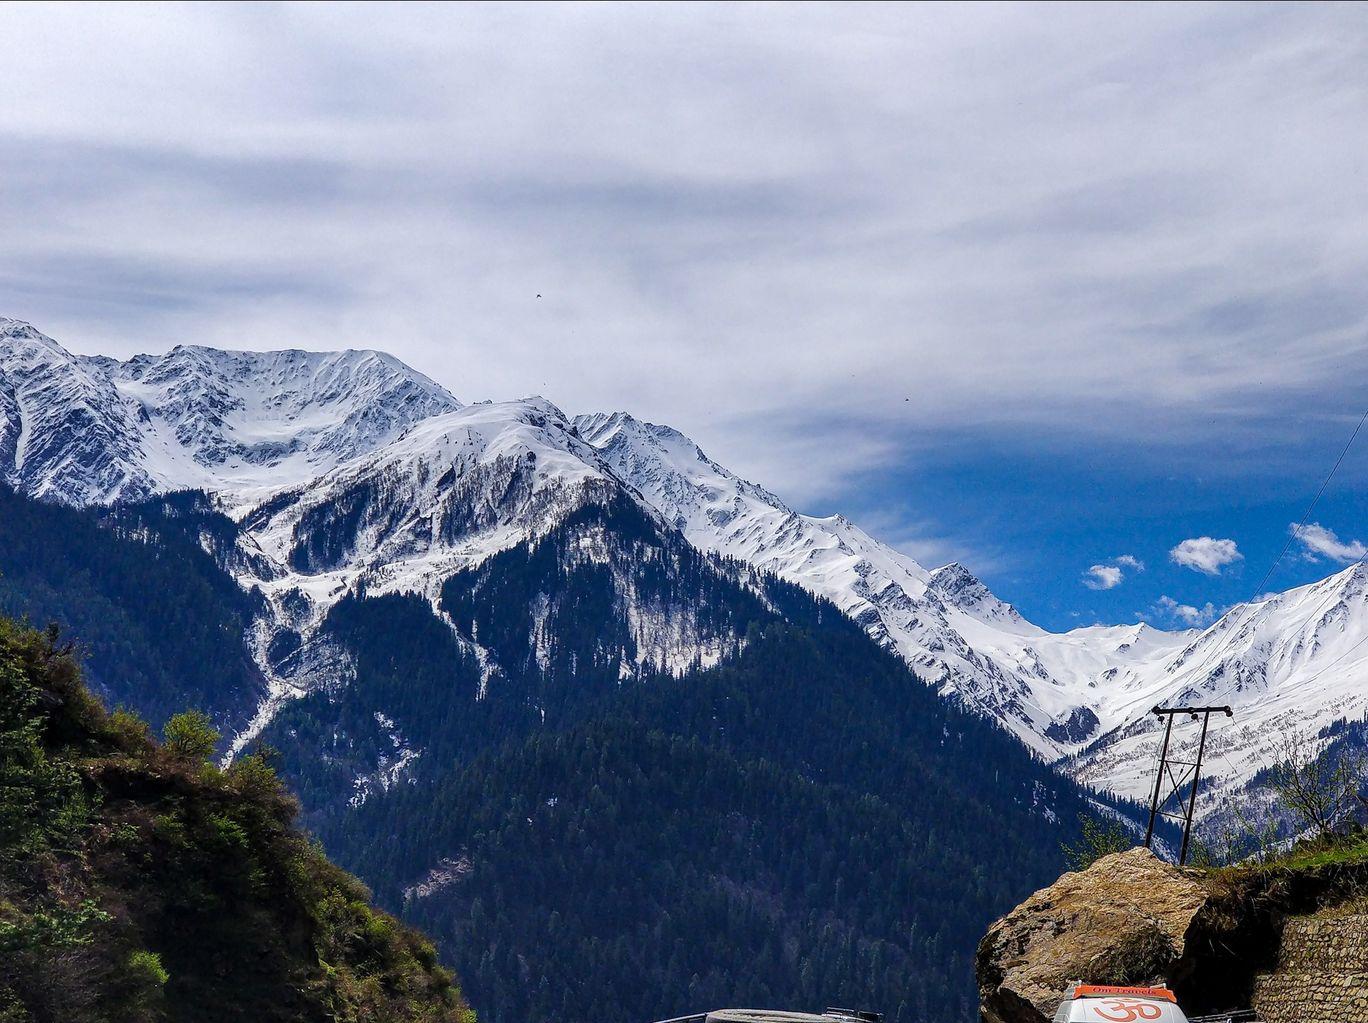 Photo of Kheerganga Tours & Adventure By Abhishek Singh (Abhi)